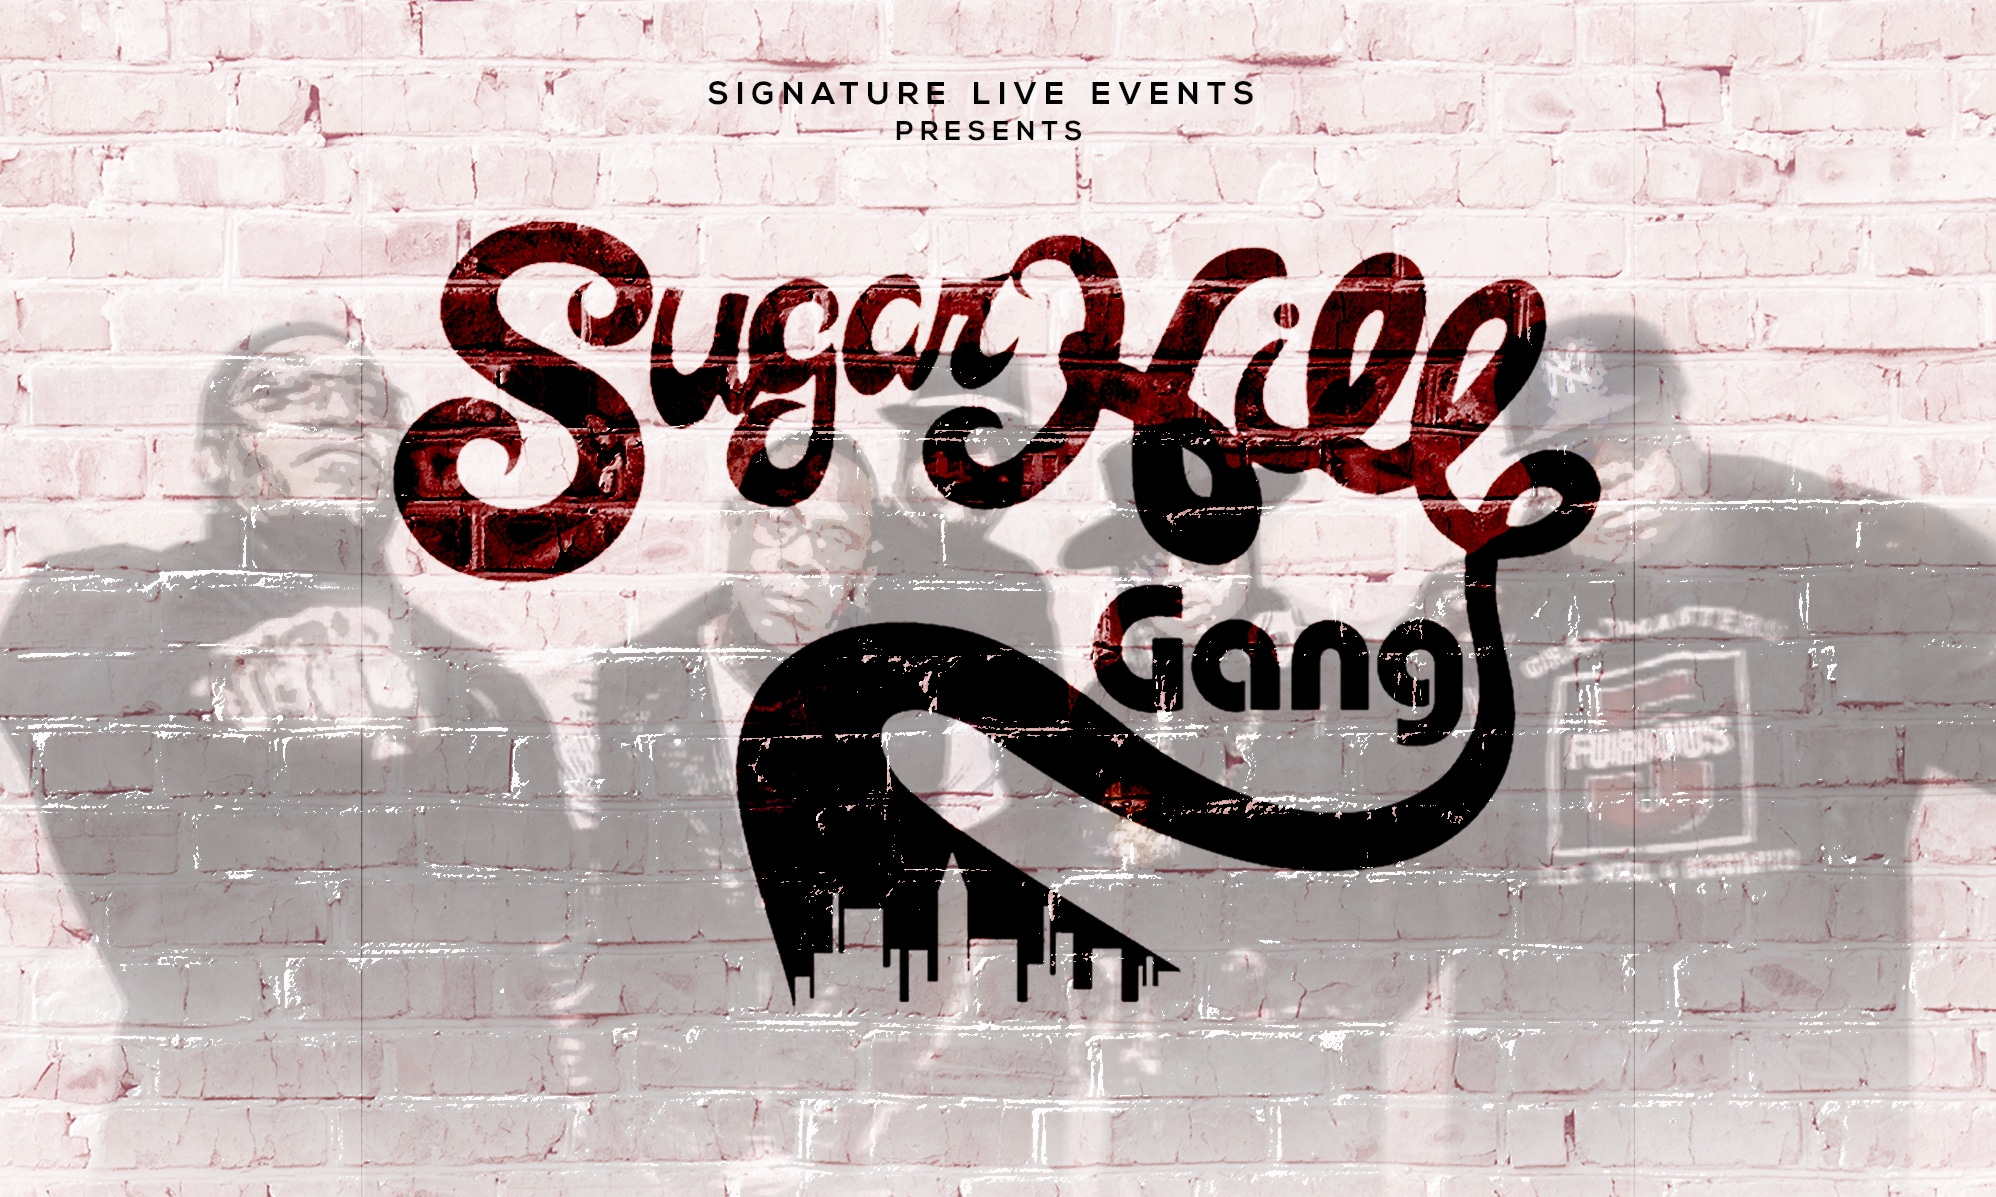 sugarhill gang - live music event liverpool